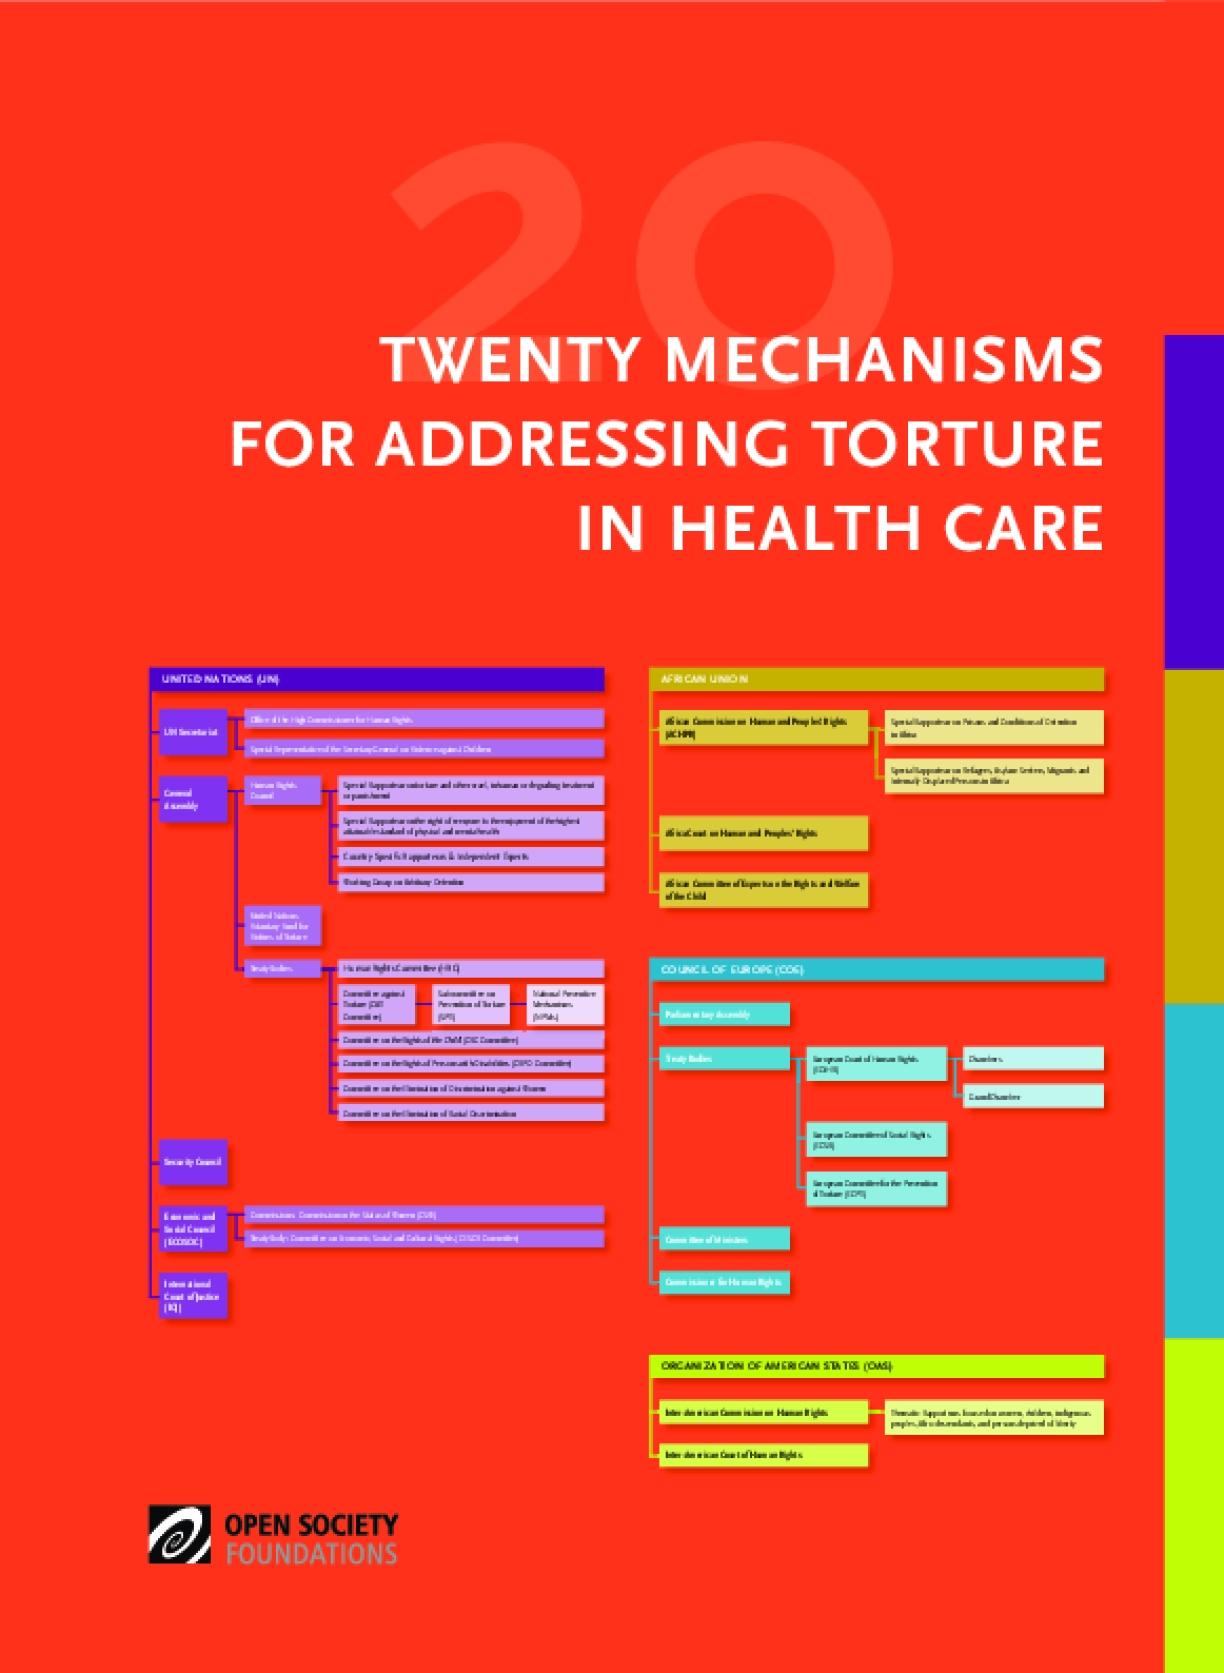 Twenty Mechanisms for Addressing Torture in Health Care